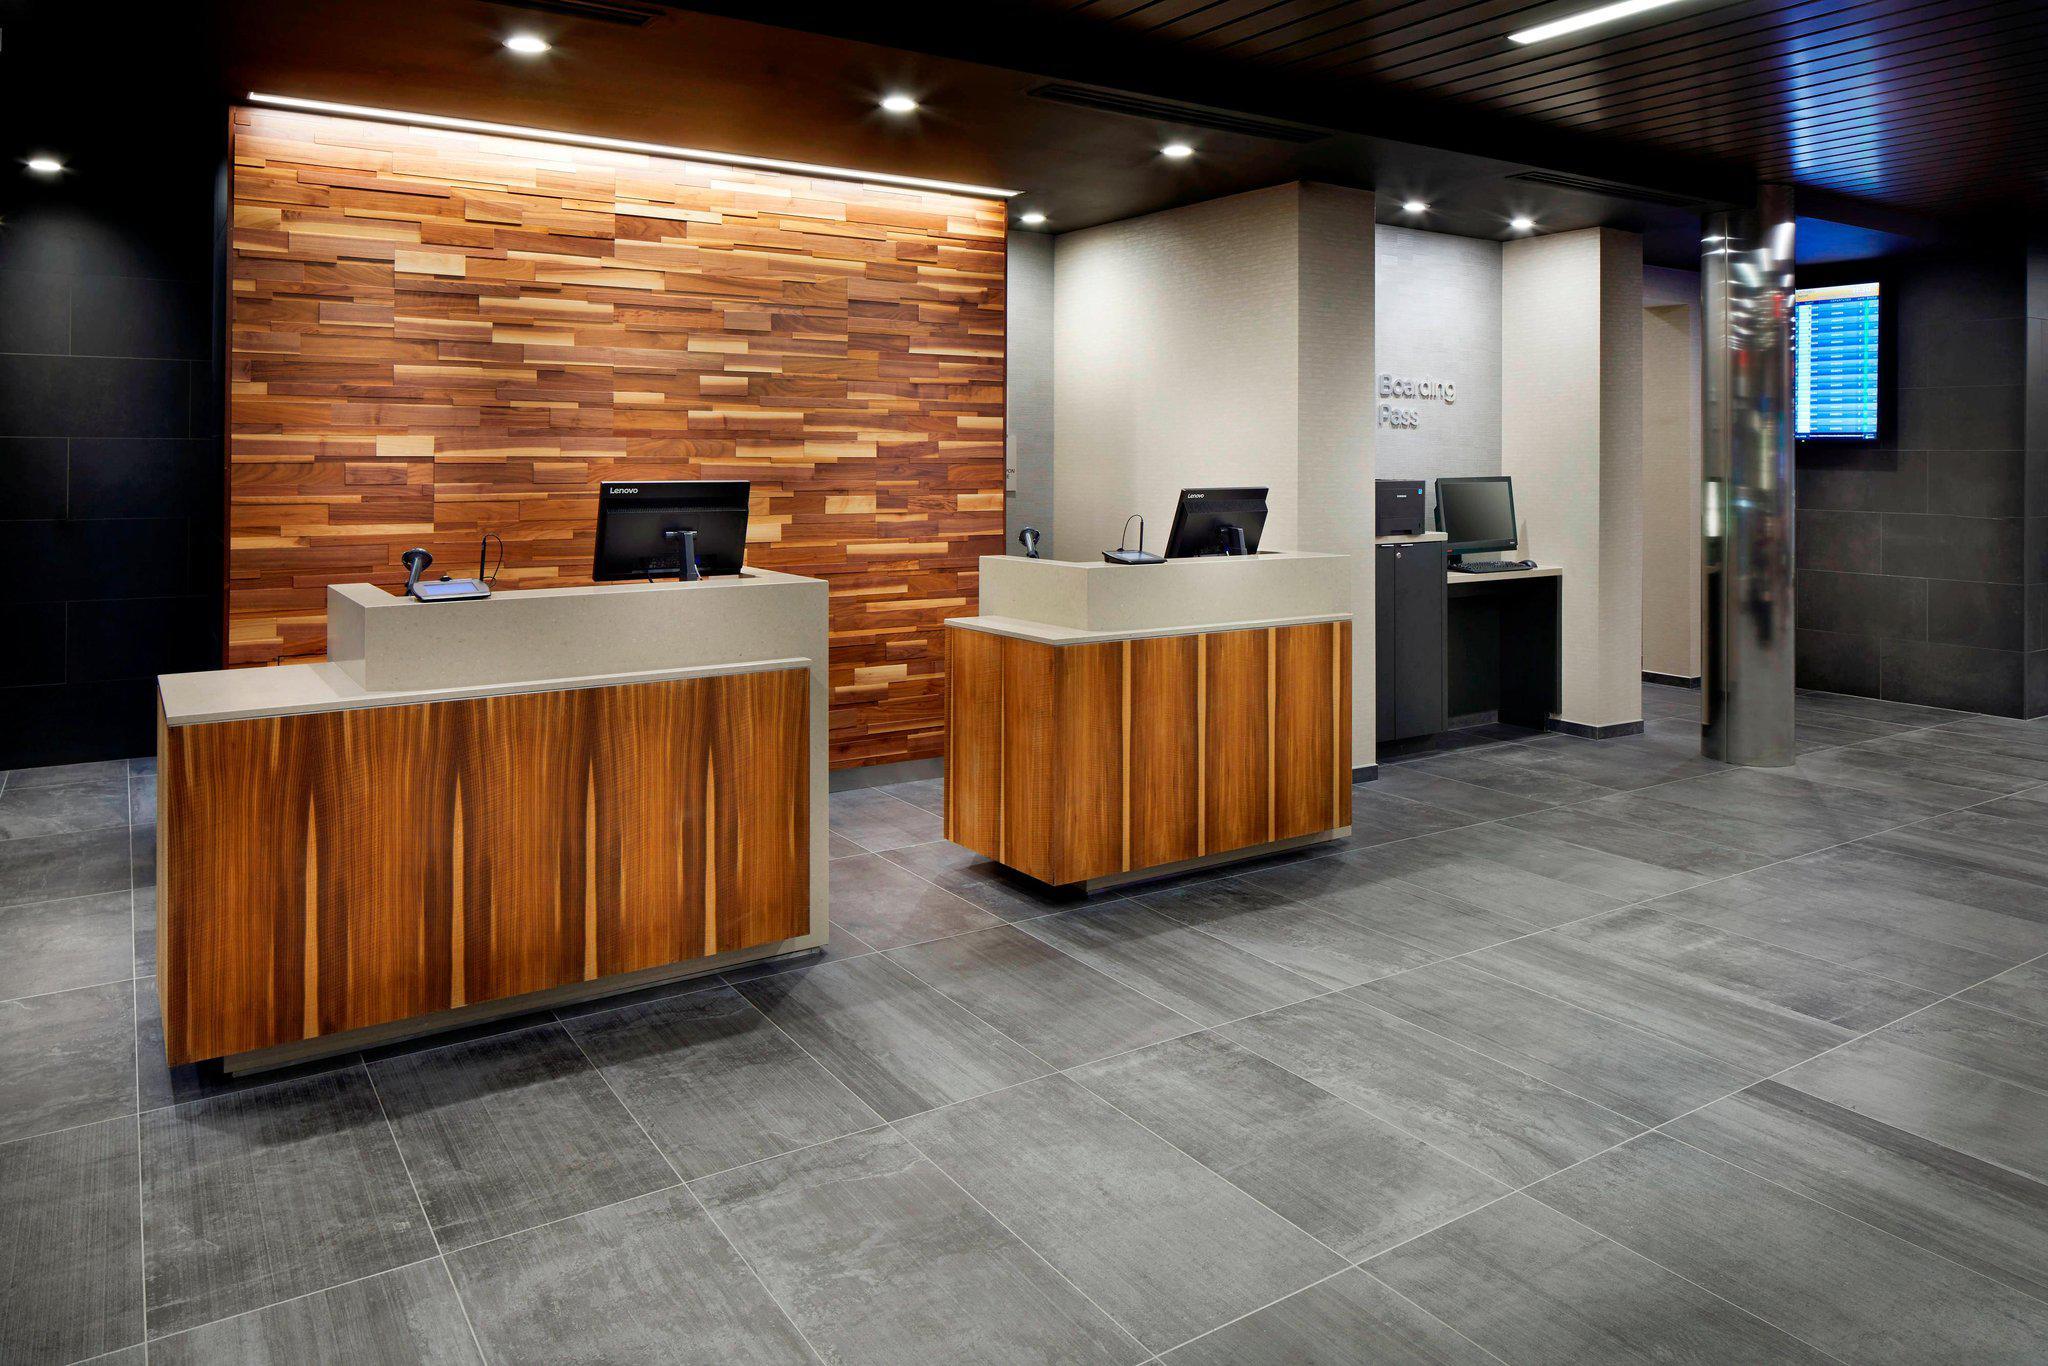 Courtyard by Marriott Houston Intercontinental Airport